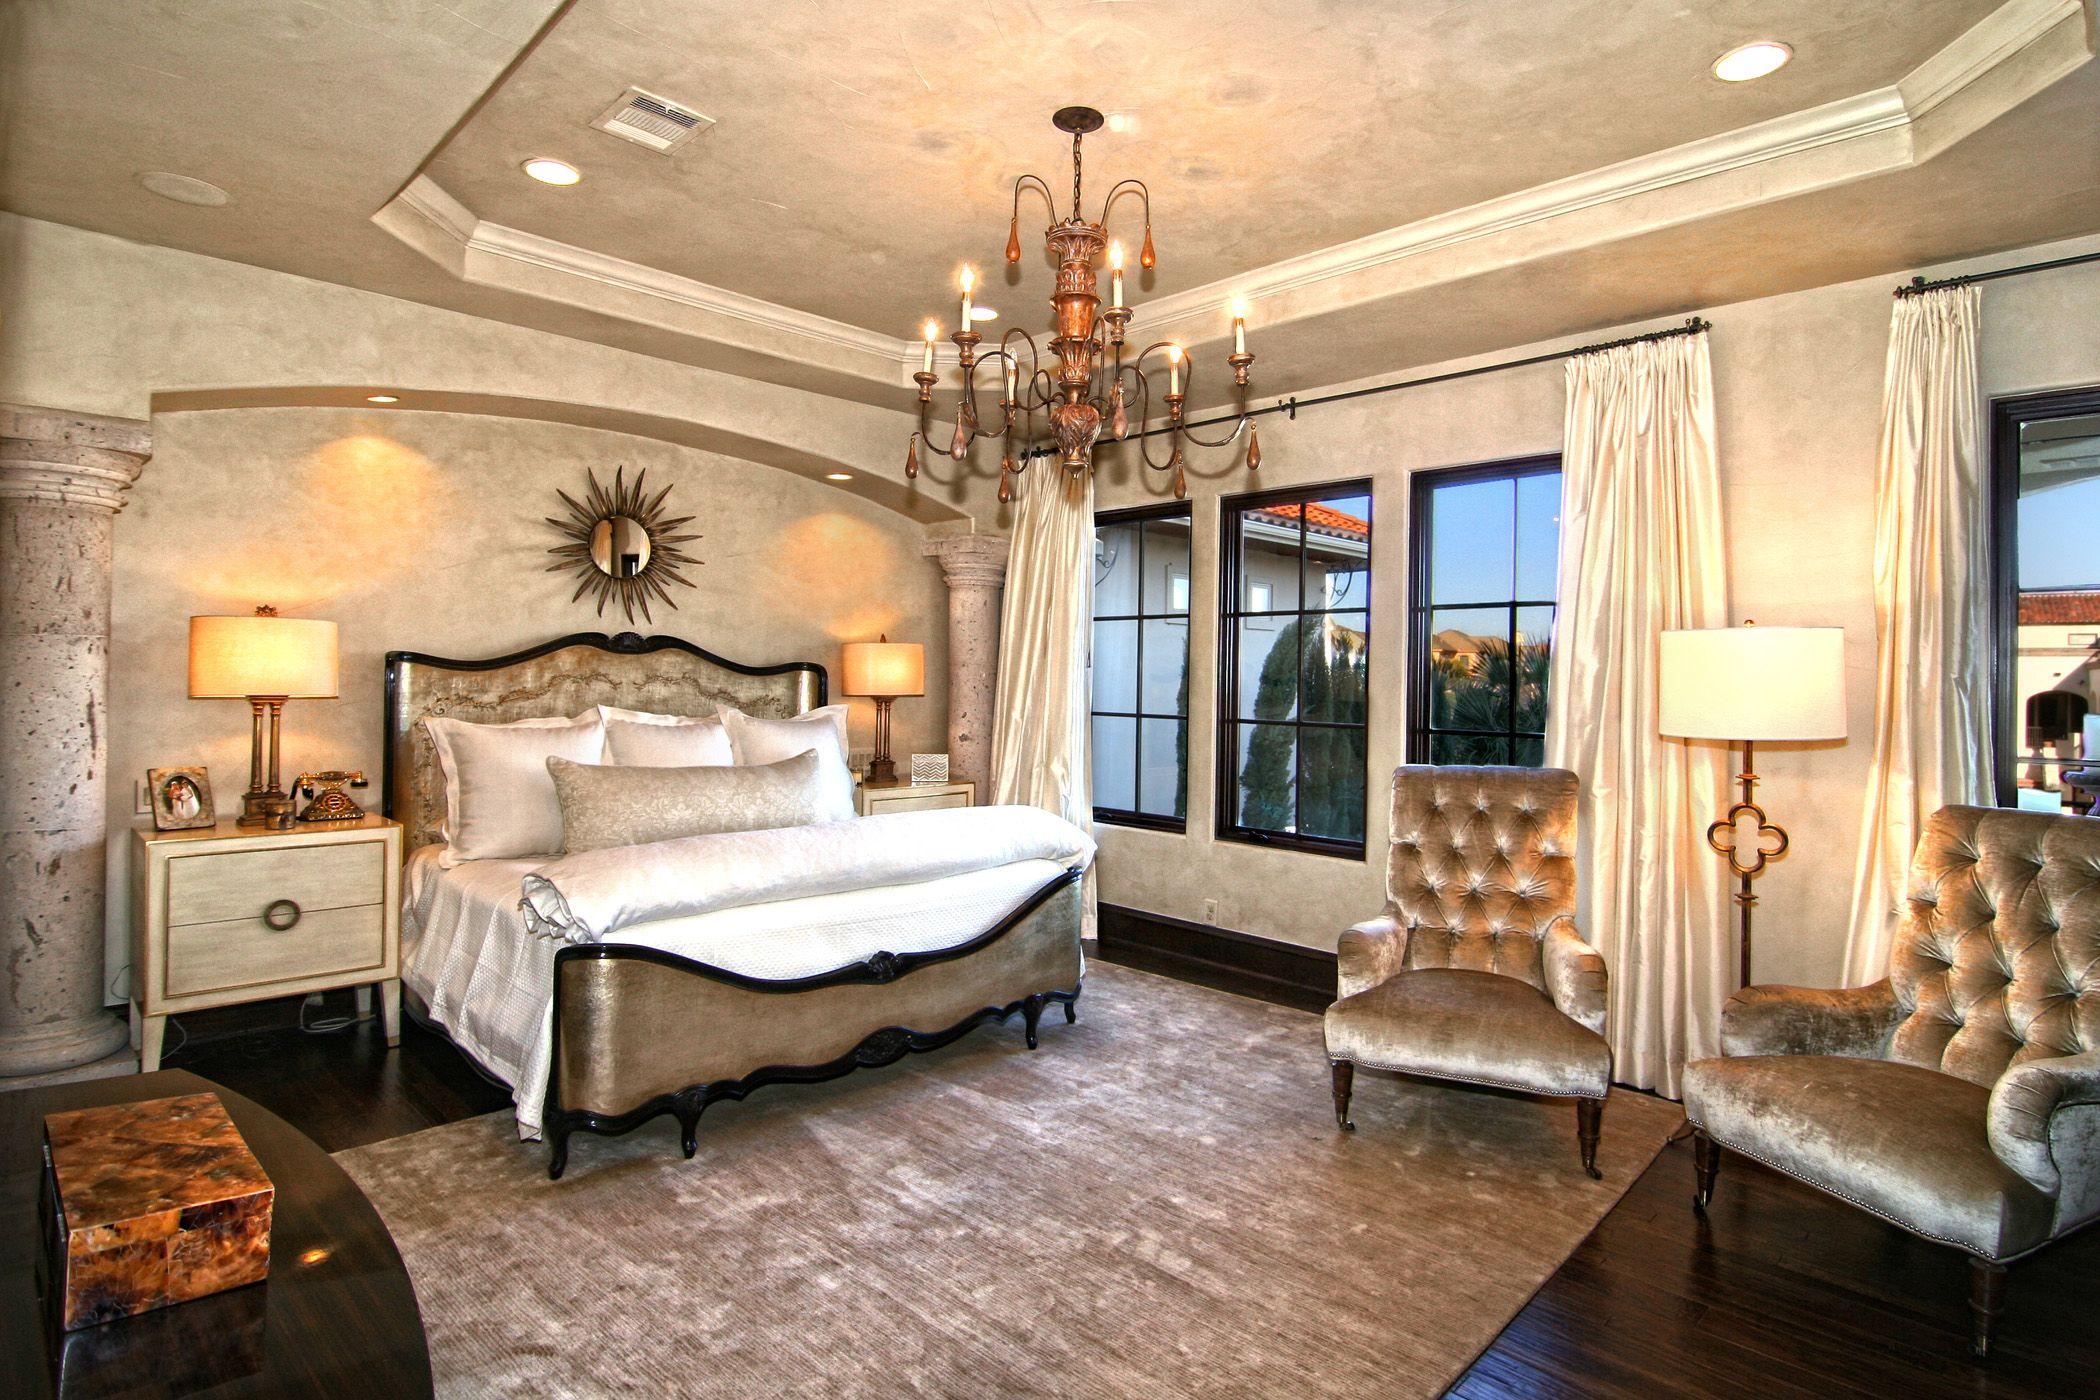 Elegant Small Bedroom Design Ideas (Stylish, Art Touching ...